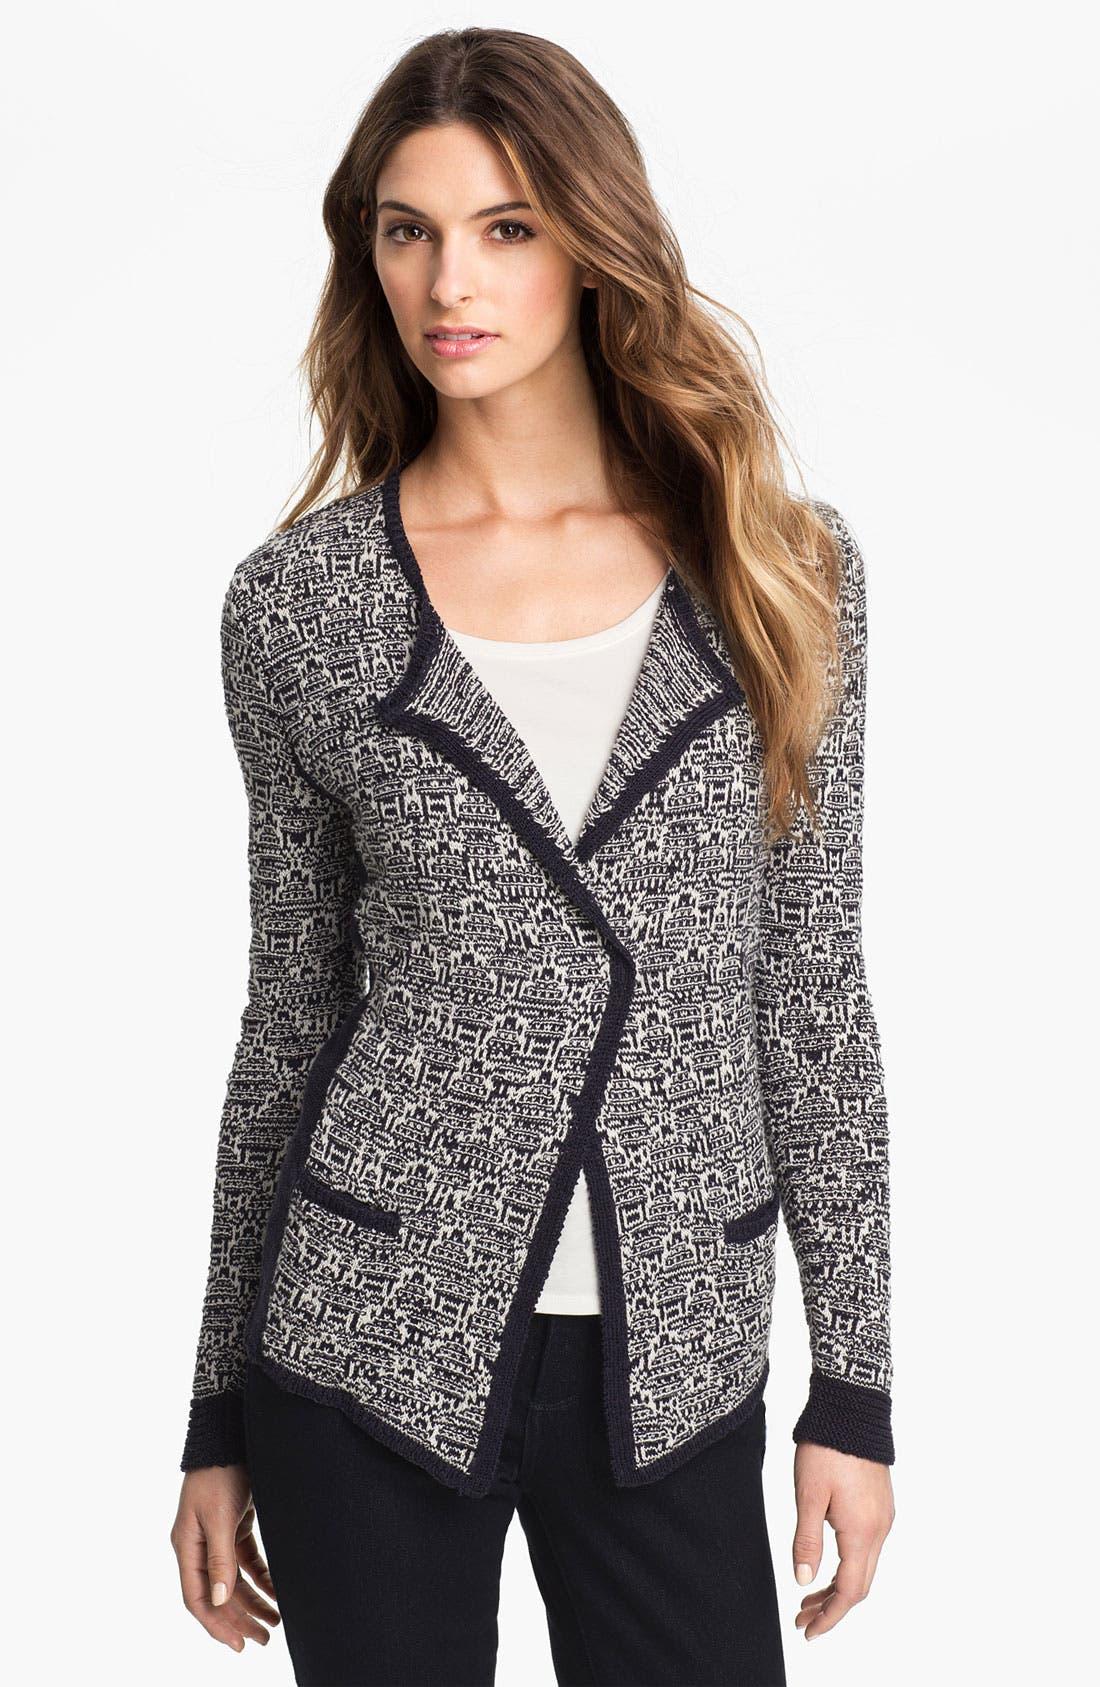 Main Image - Nic + Zoe 'Mixy' Sweater Jacket (Petite)